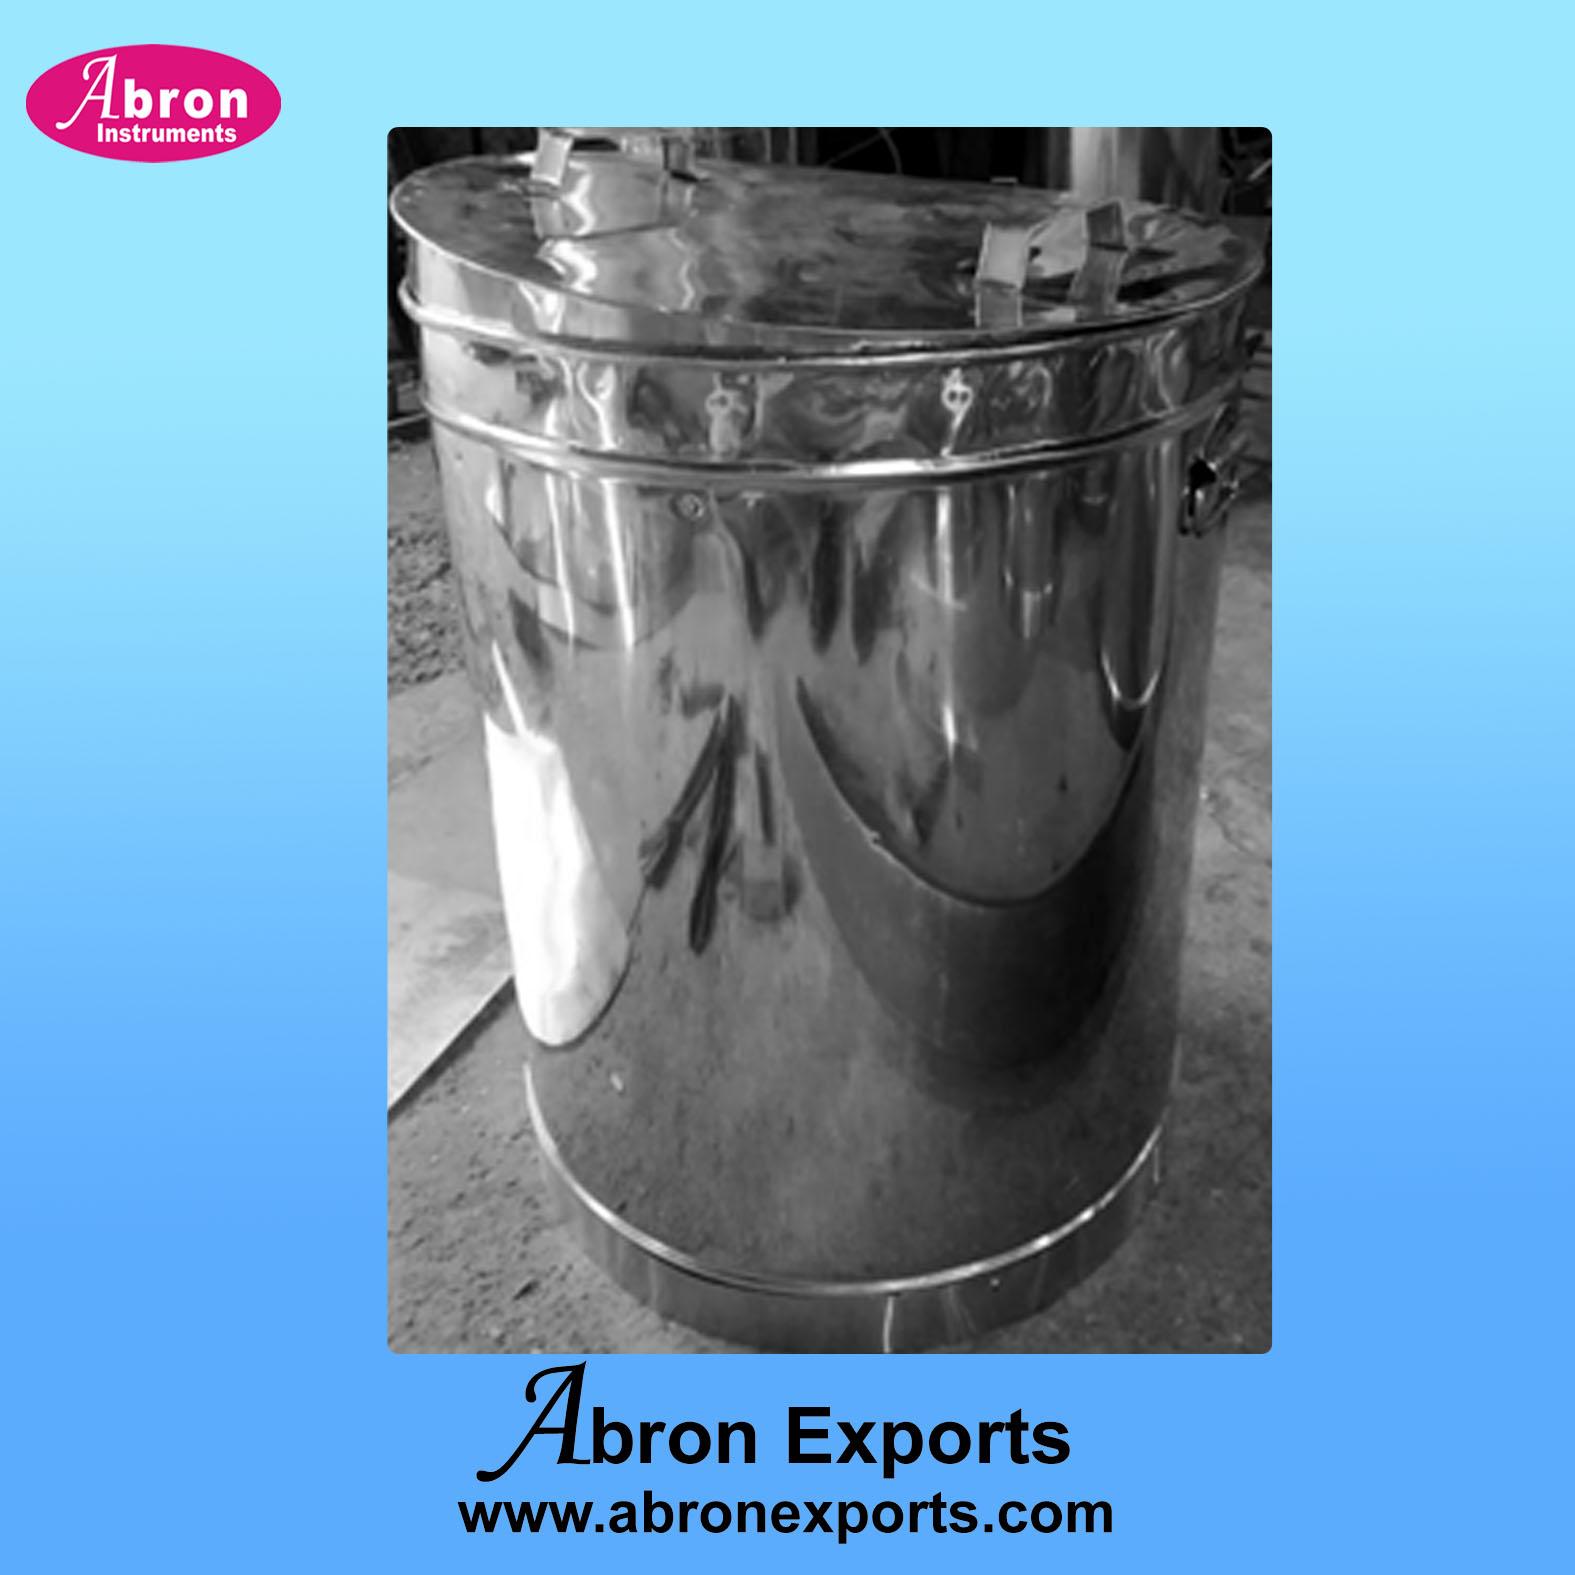 Honey Packing Honey Strainer Stainless Steel Fine Mesh Abron AT-9514